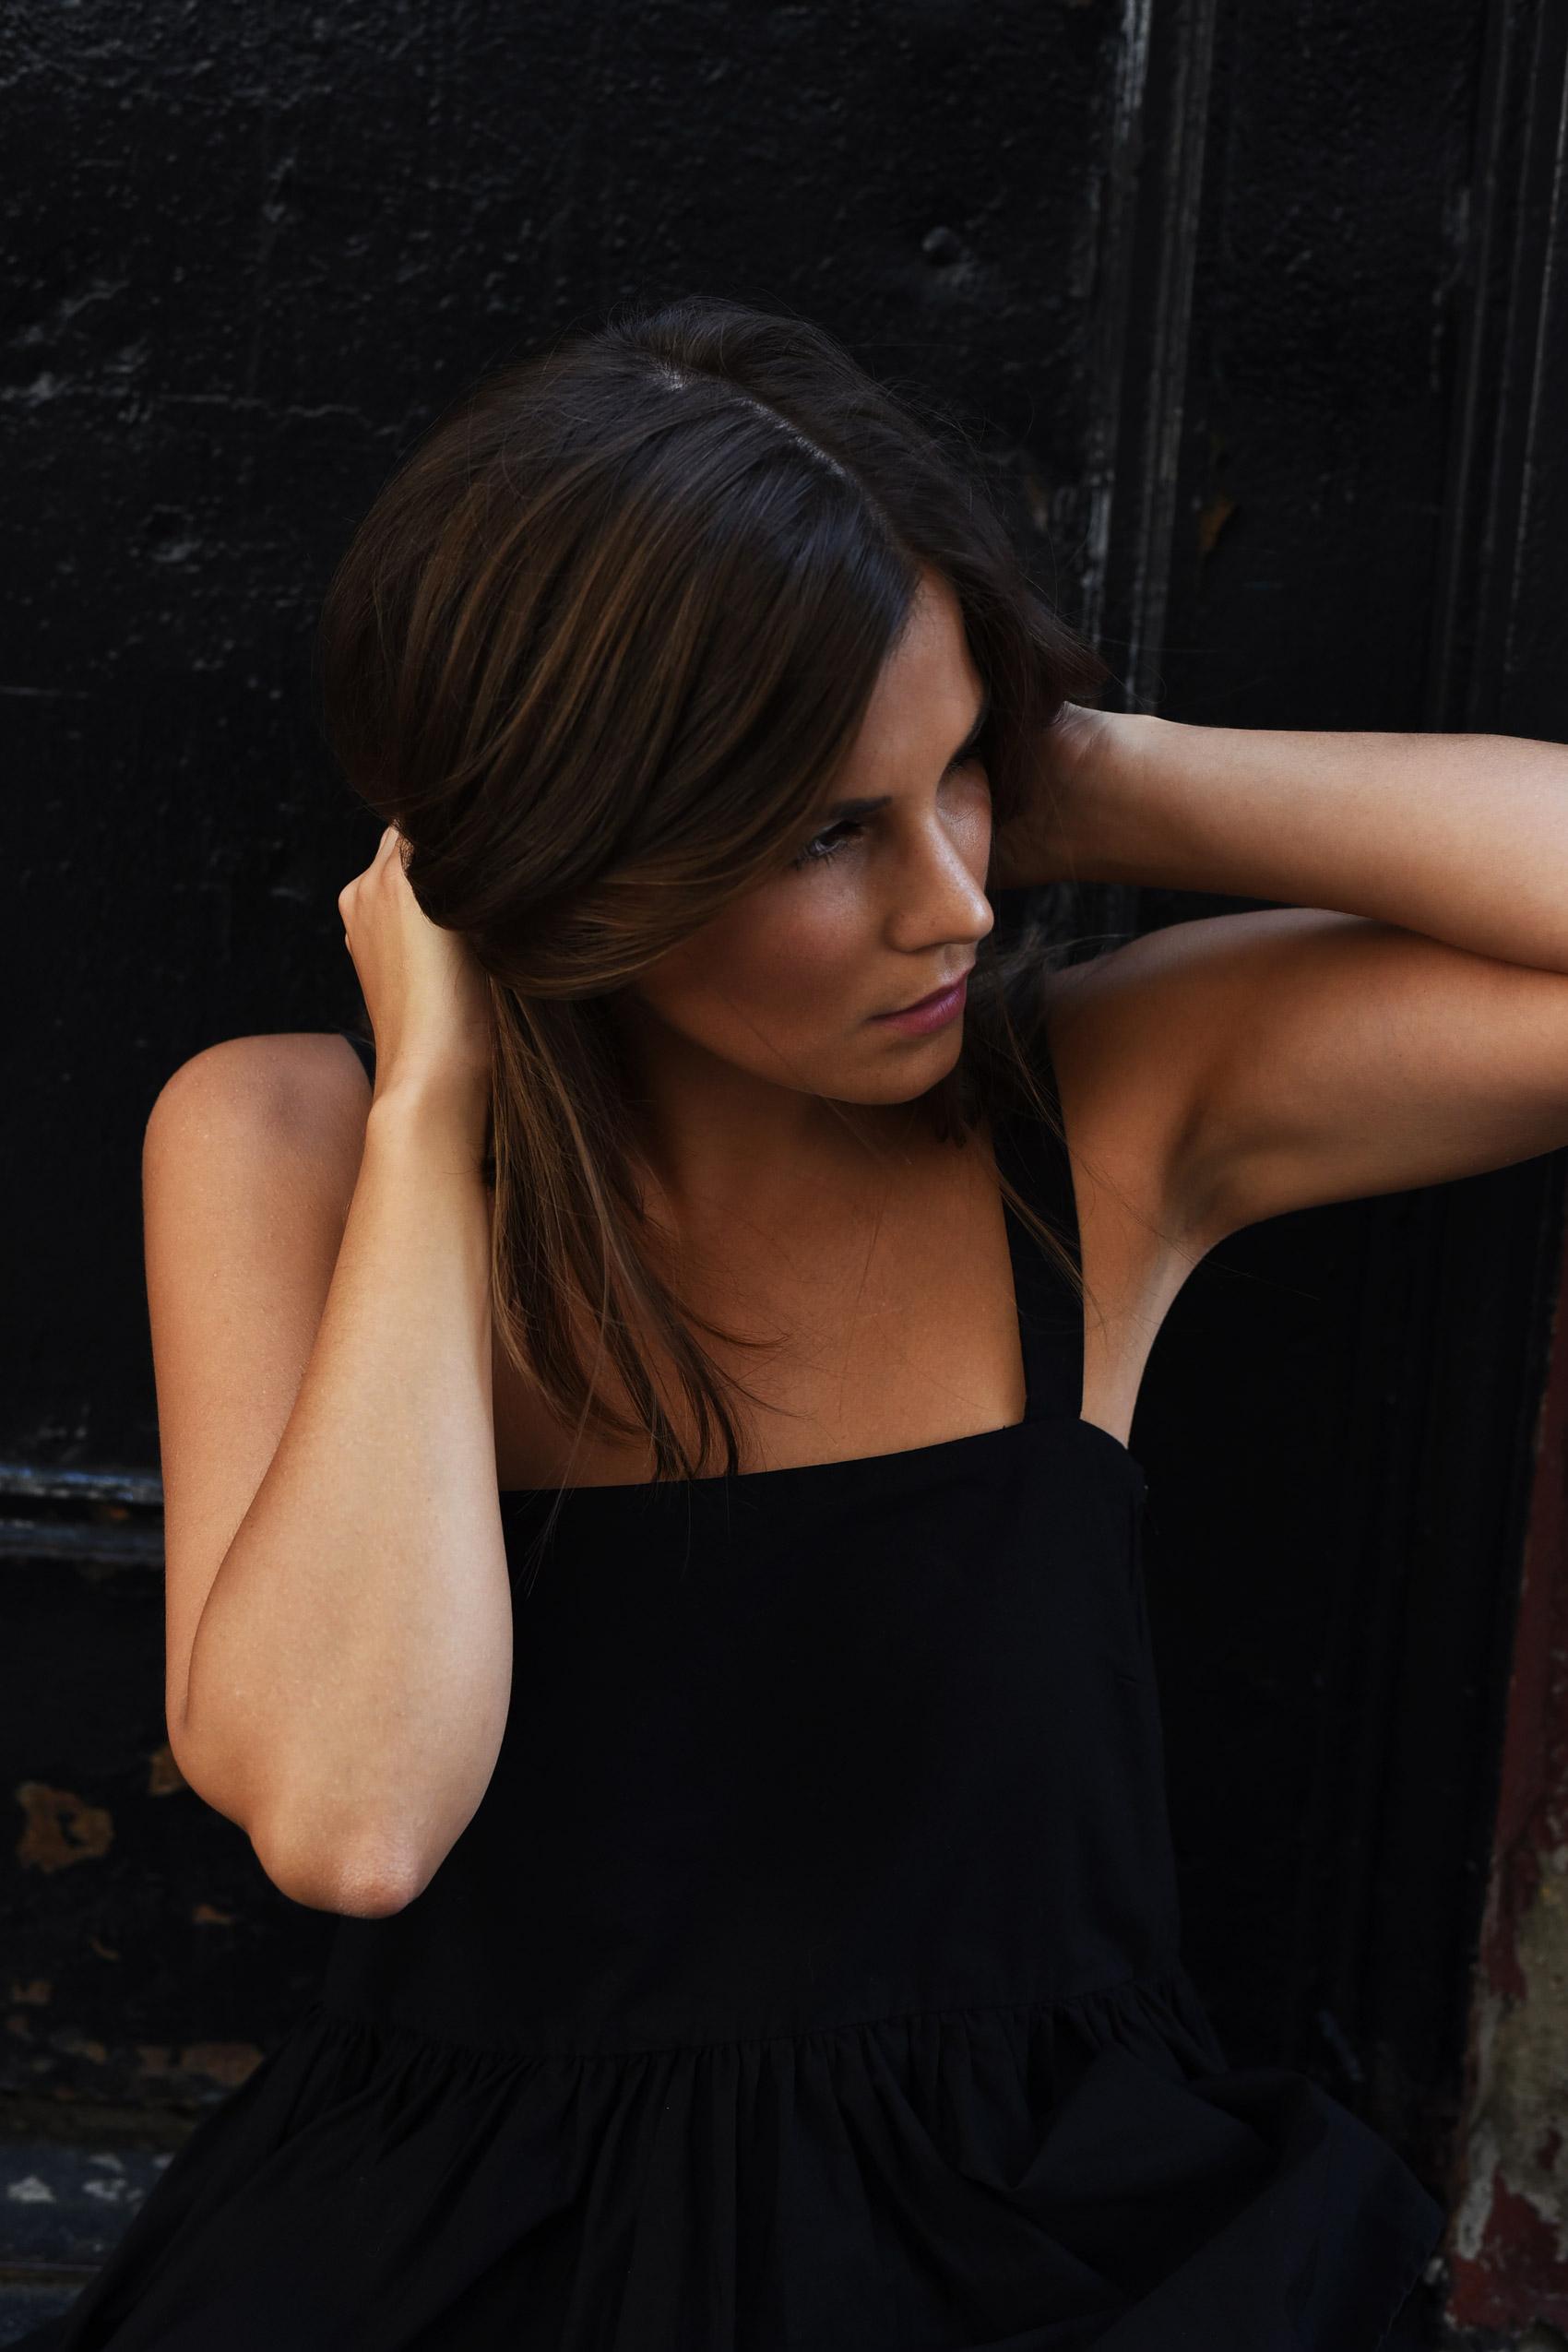 calvi-hair-cut-nina-fashiioncarpet-haar-schnitt-frisur-blogger